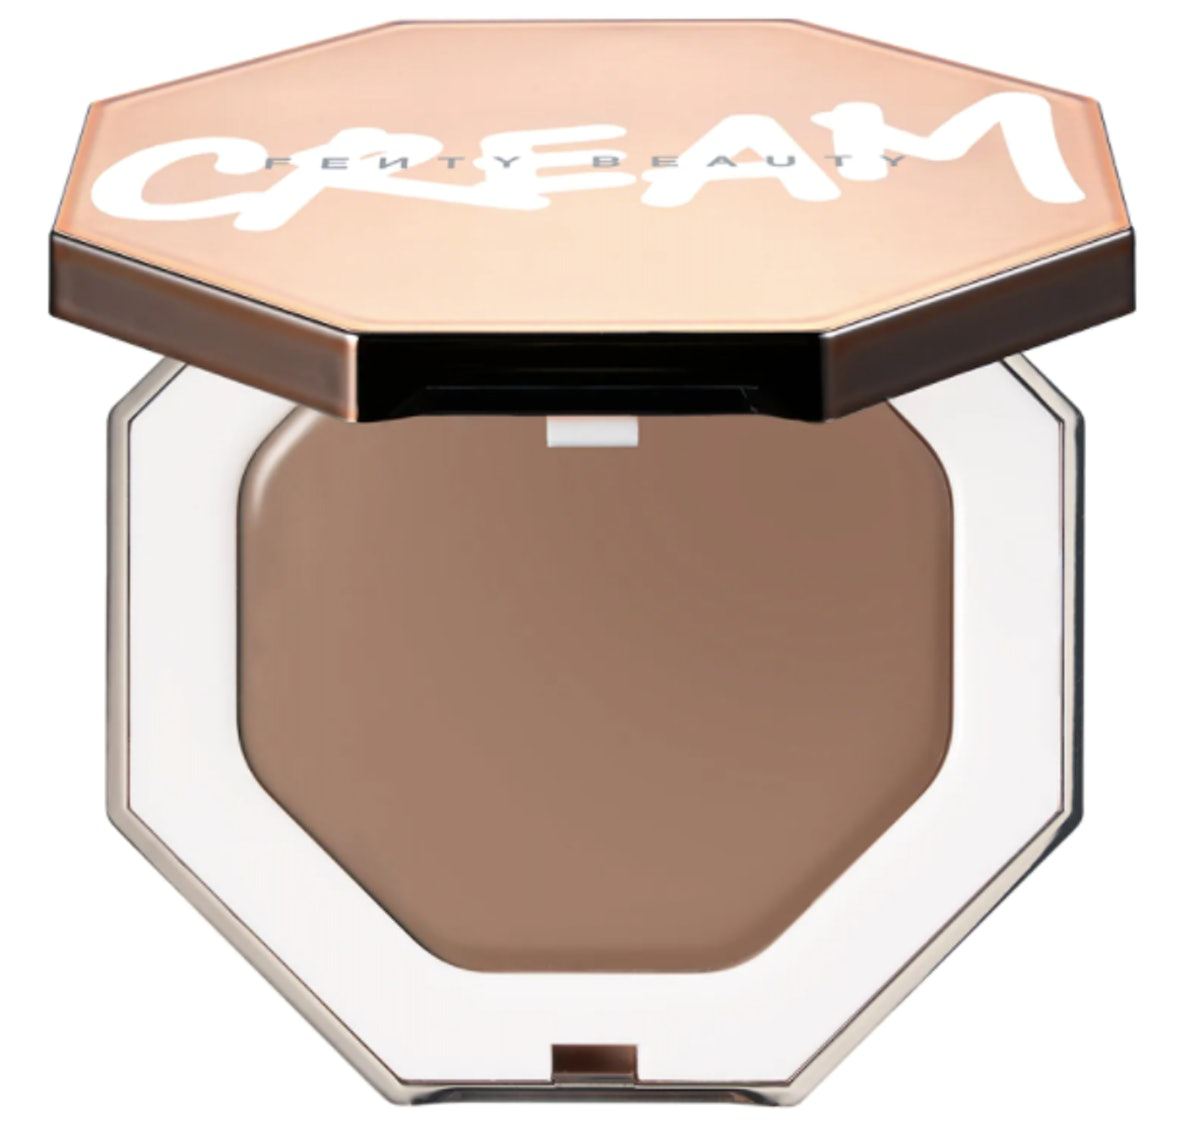 Cheeks Out Freestyle Cream Bronzer